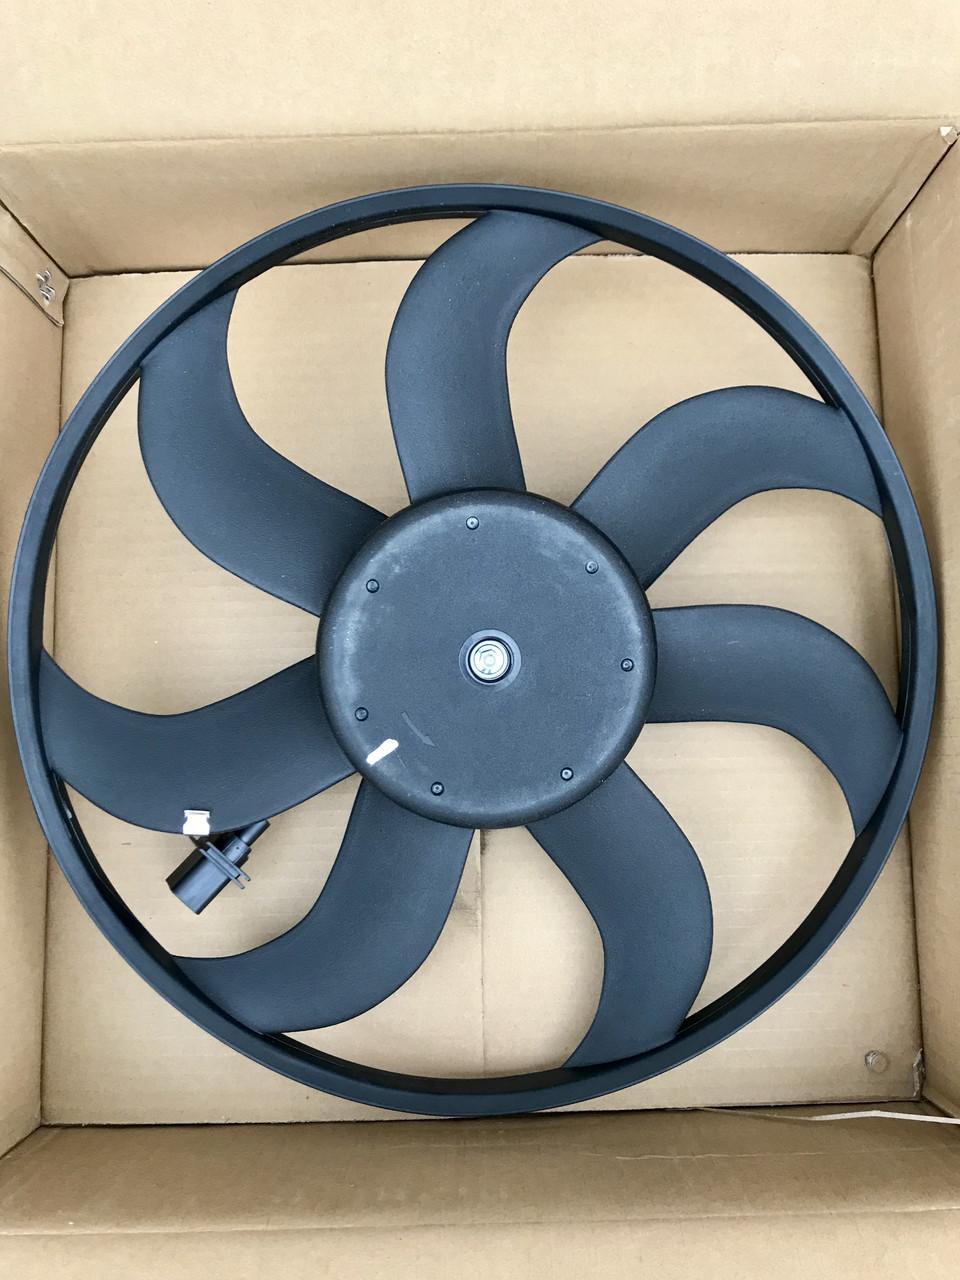 Вентилятор радиатора Skoda Fabia/Roomster VW Polo 390мм 6R0959455E